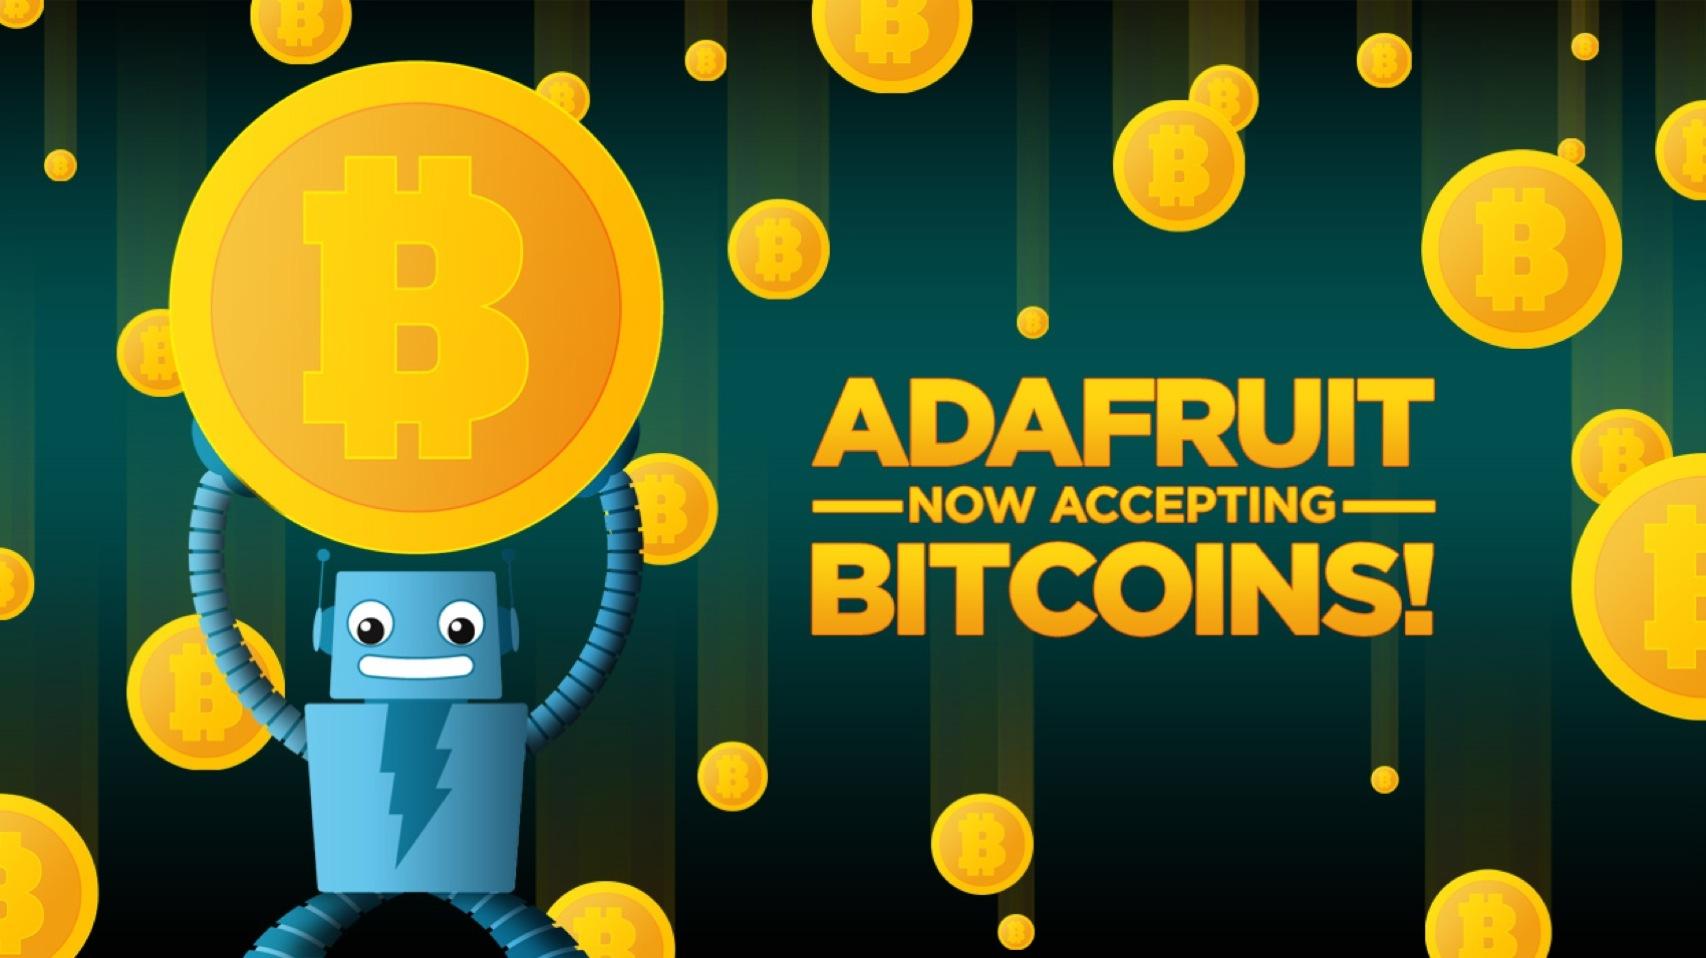 1280X698 Adafruit Bitcoin Banner-2